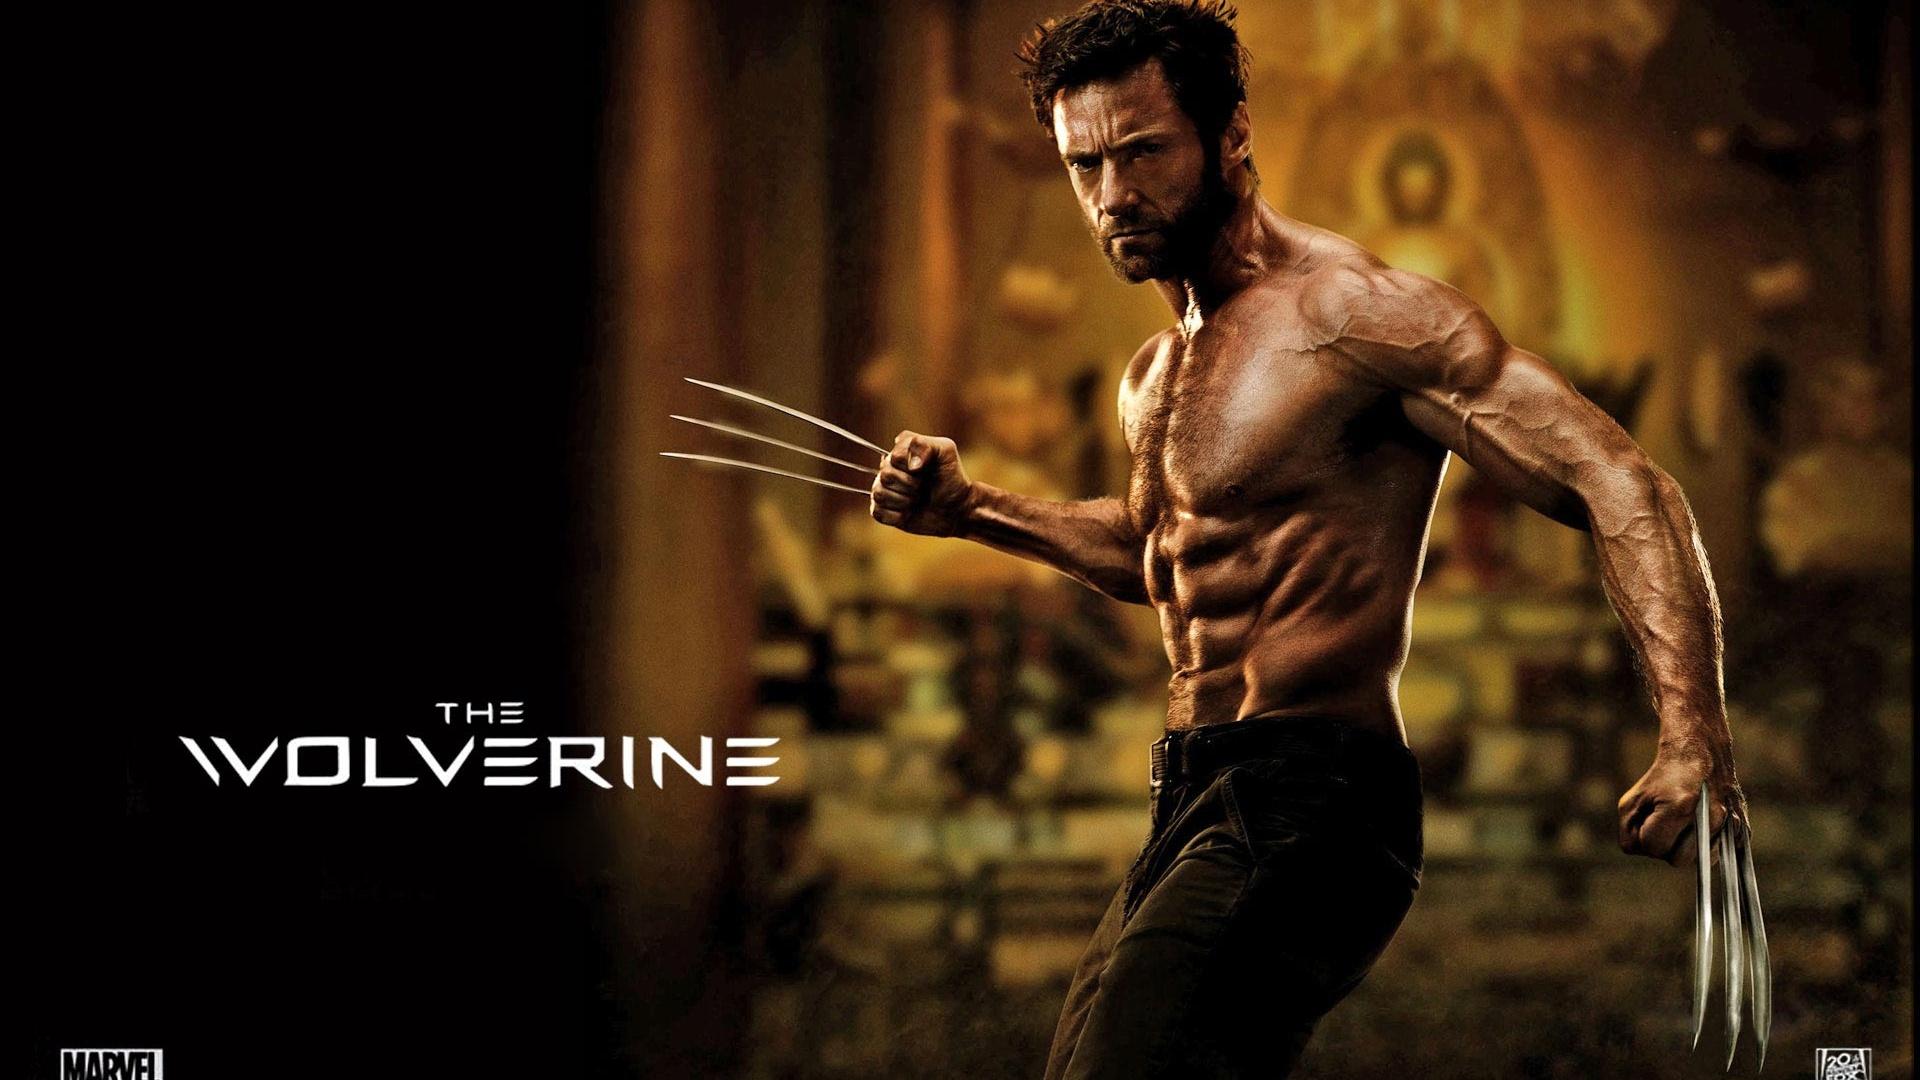 Wallpaper X Men Origins Wolverine 2 1920x1200 Hd Picture Image